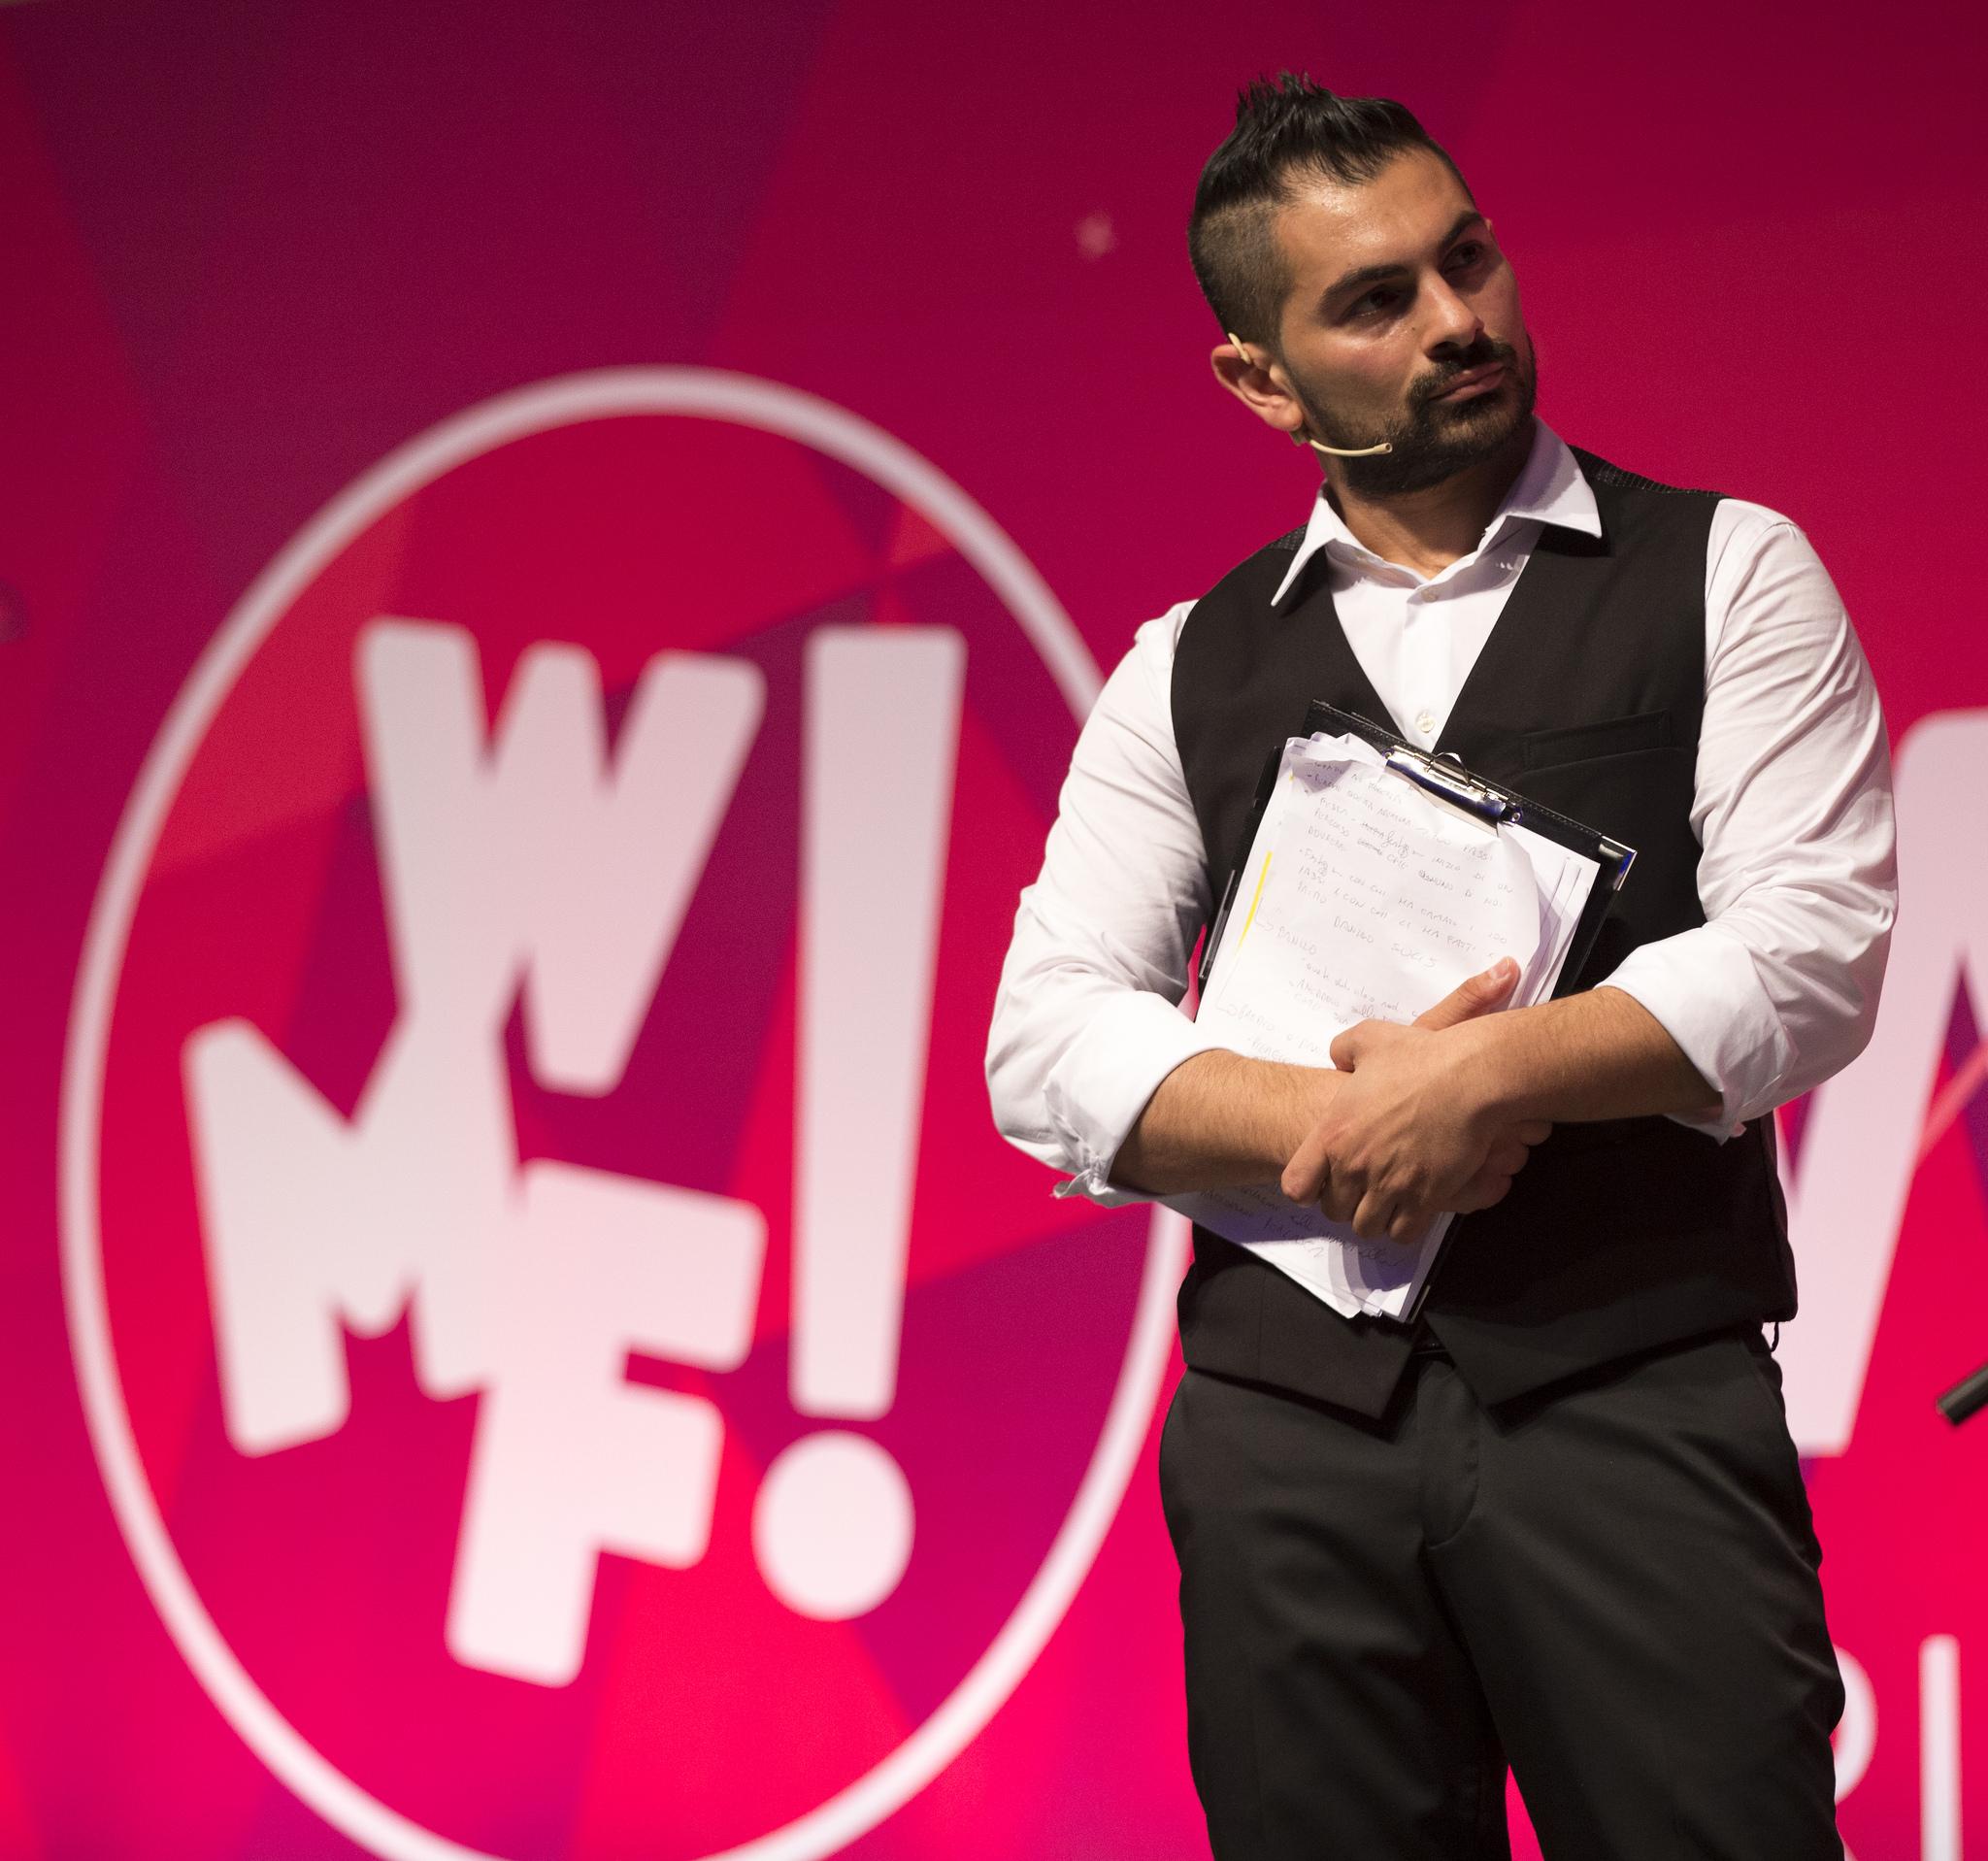 https://www.promotionmagazine.it/wp/wp-content/uploads/2018/05/WMF_Cosmano-Lombardo.jpg